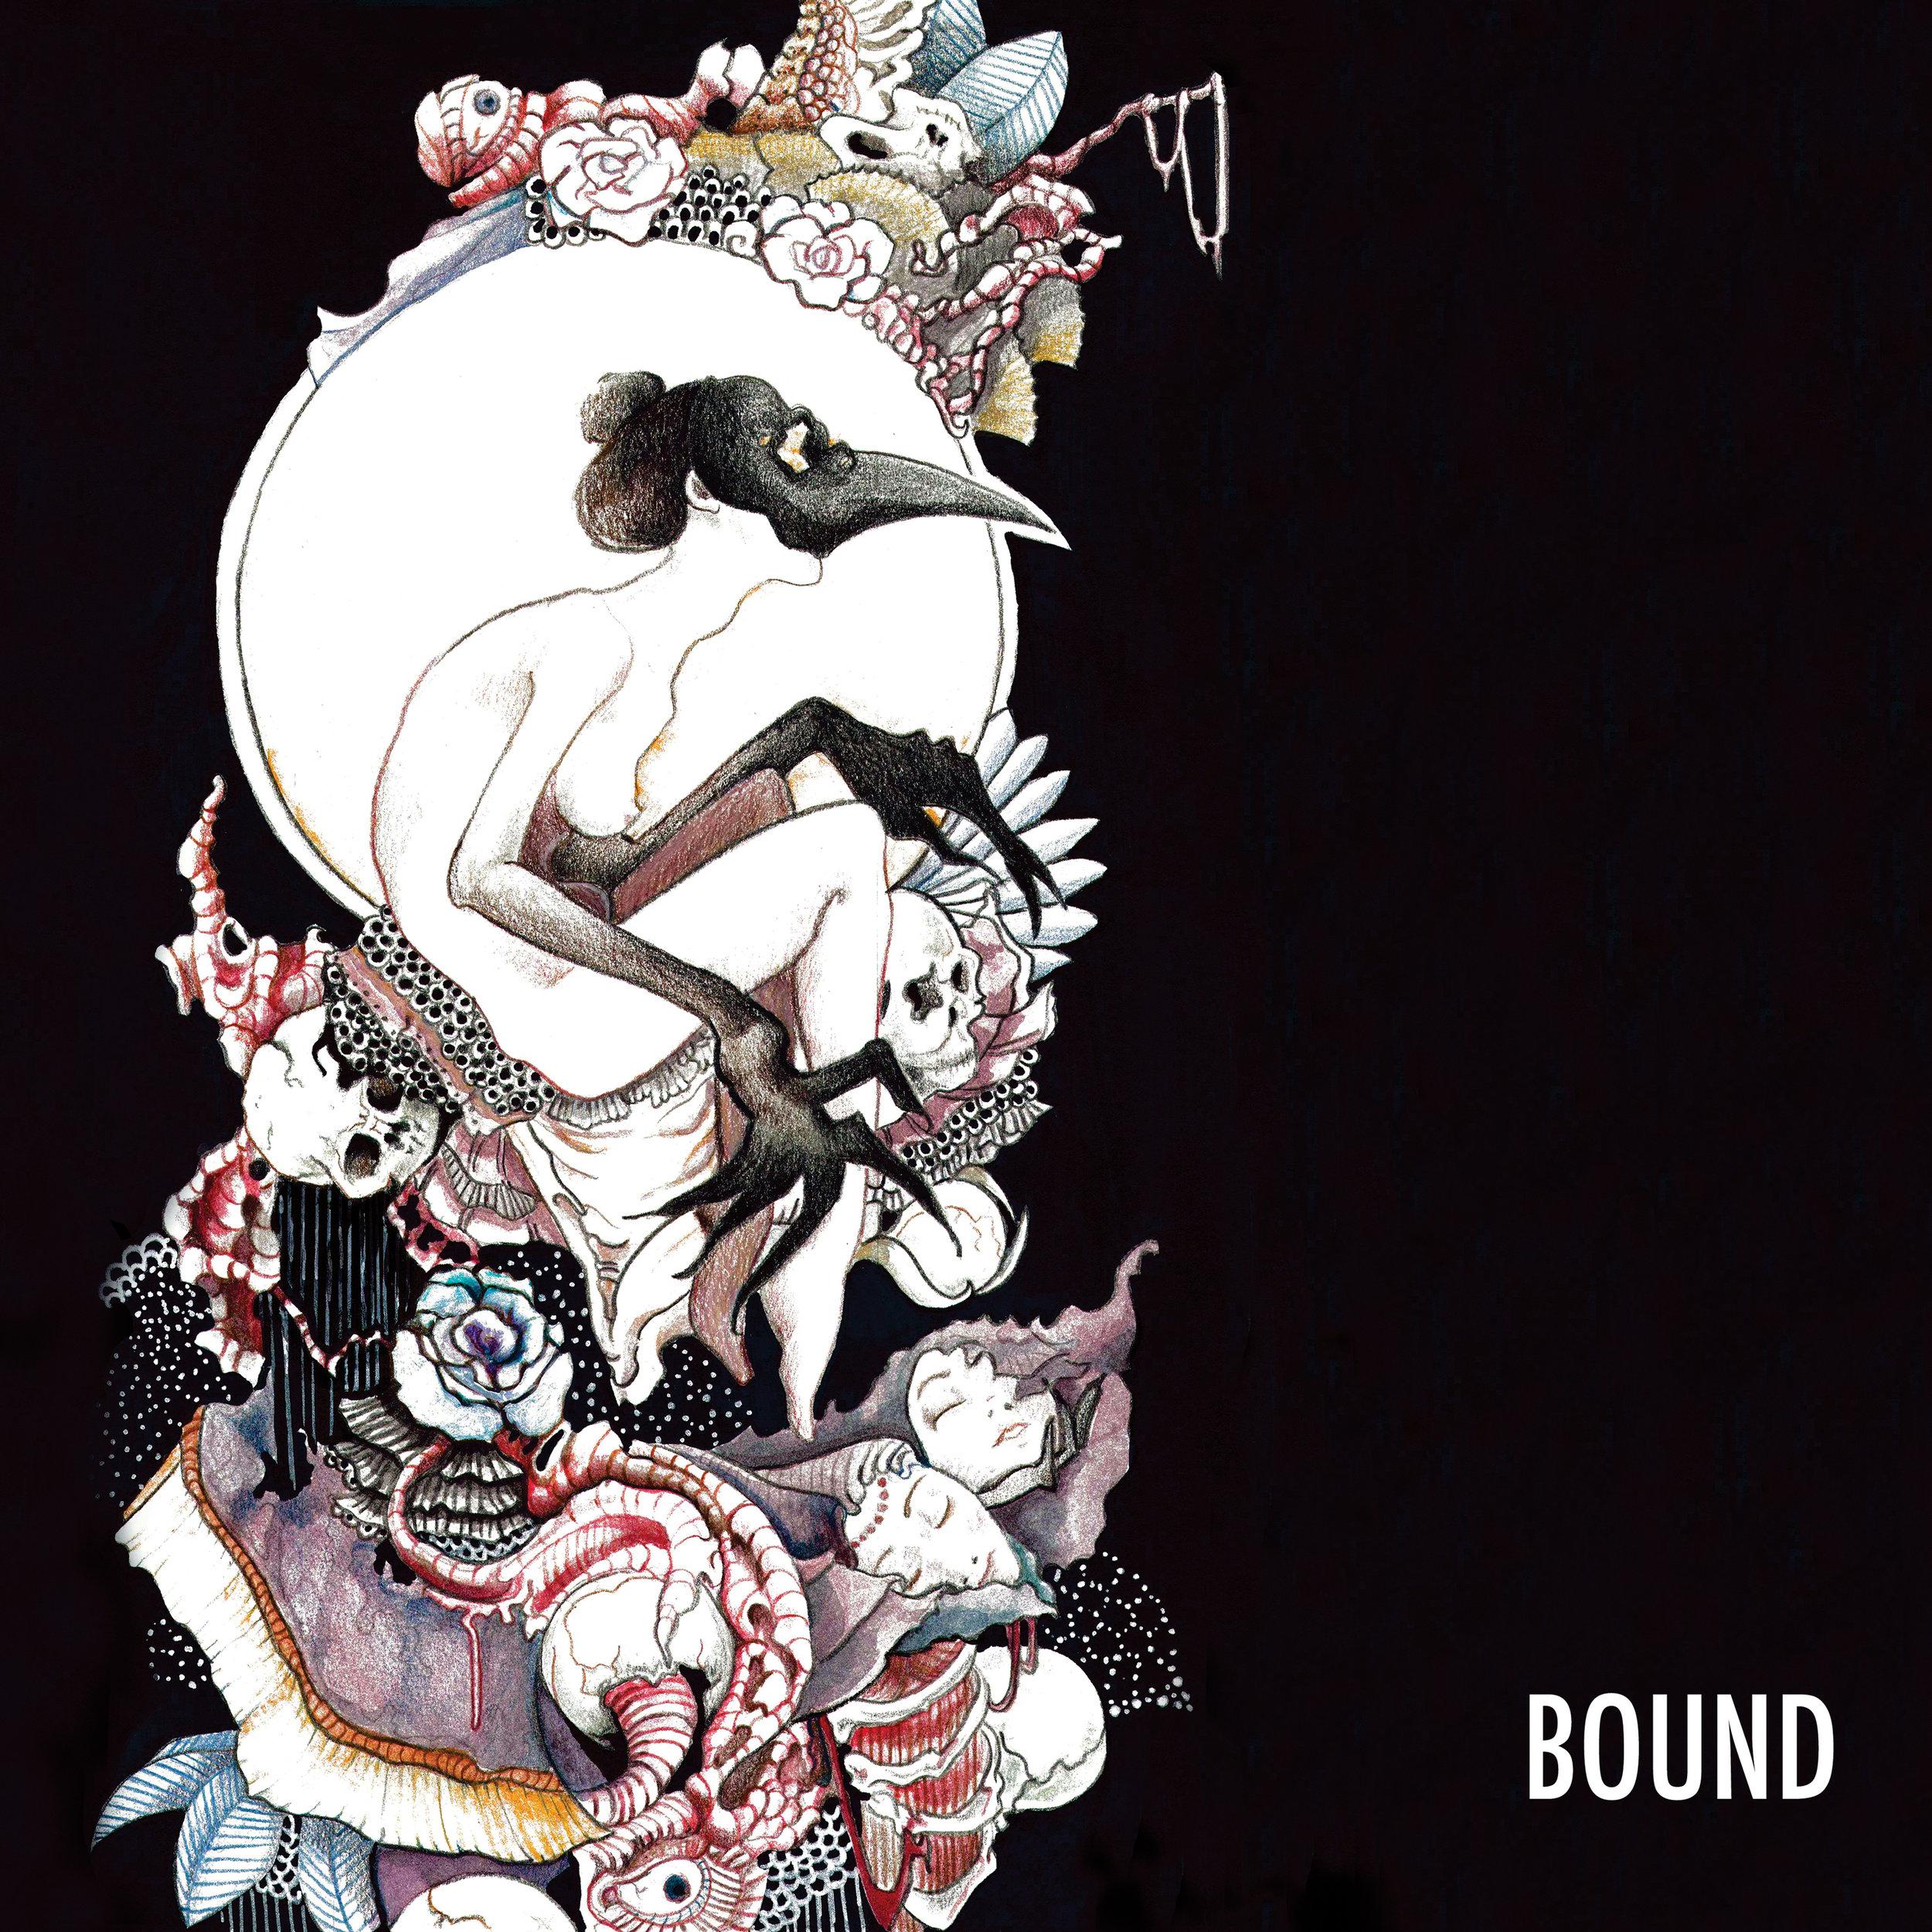 Bound_Square_Digital.jpg